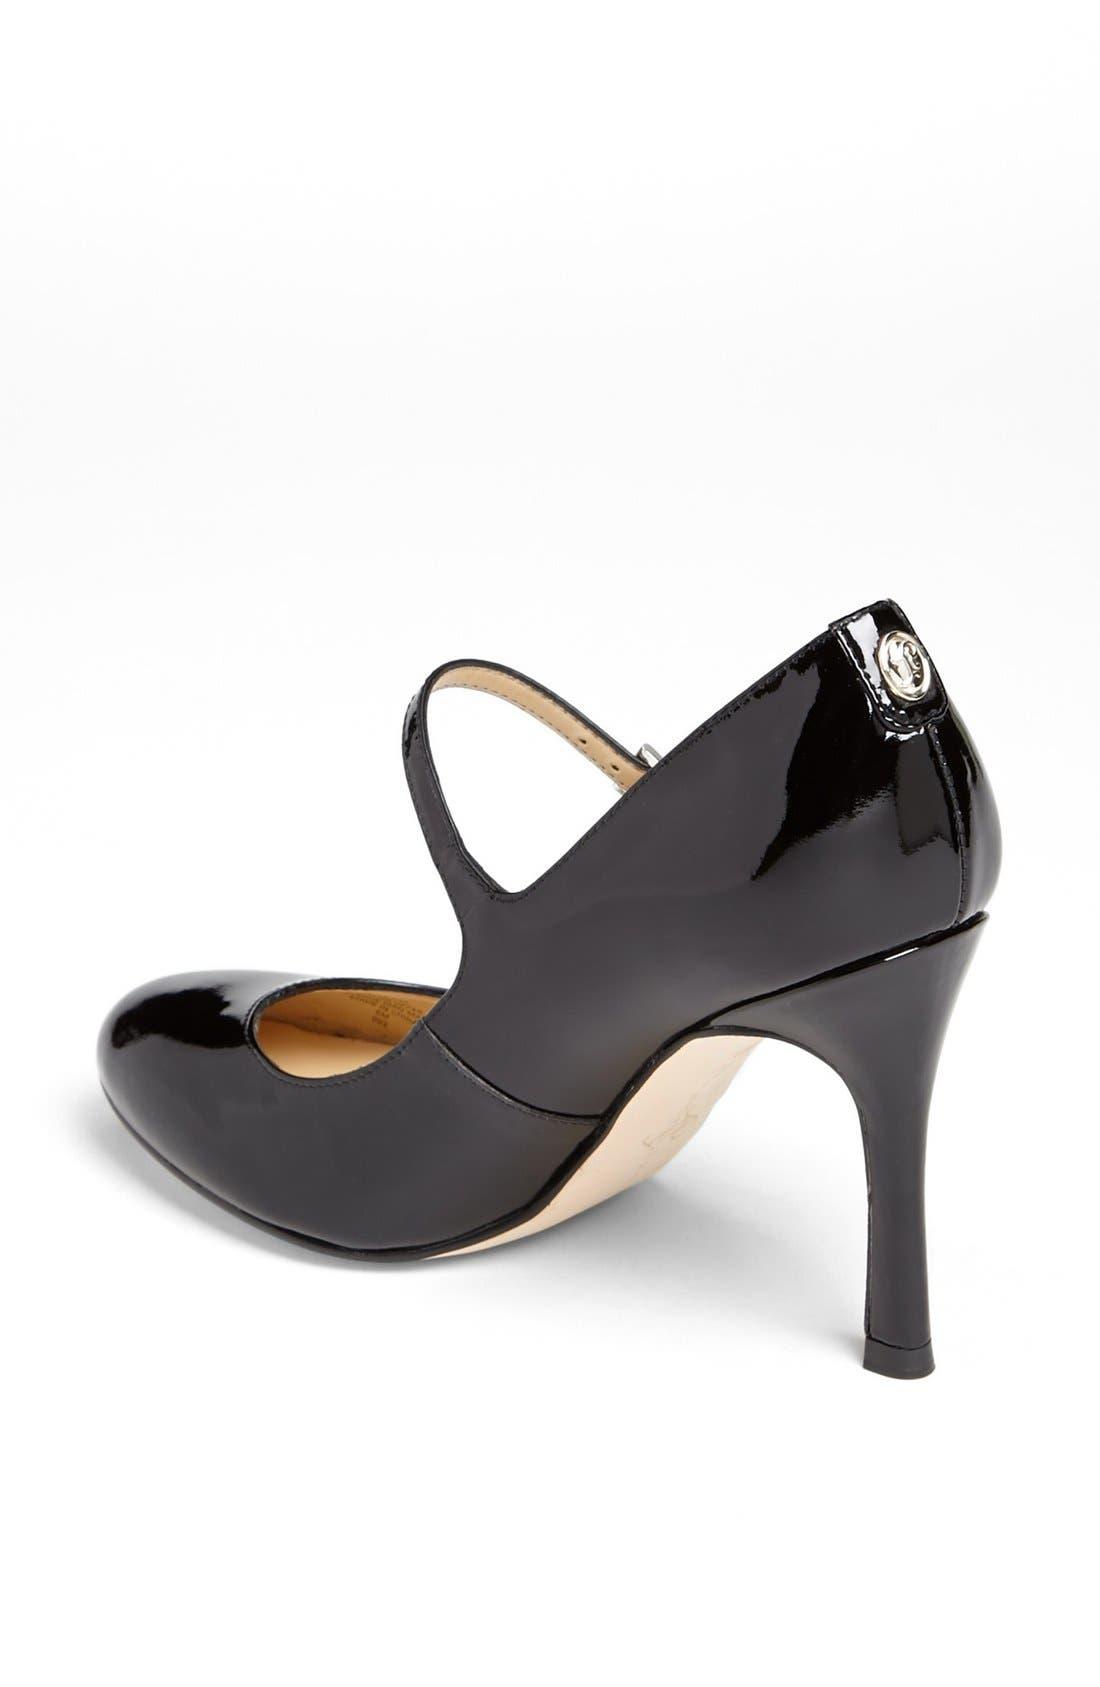 ivanka trump shoes janna little bikinis showing 730870